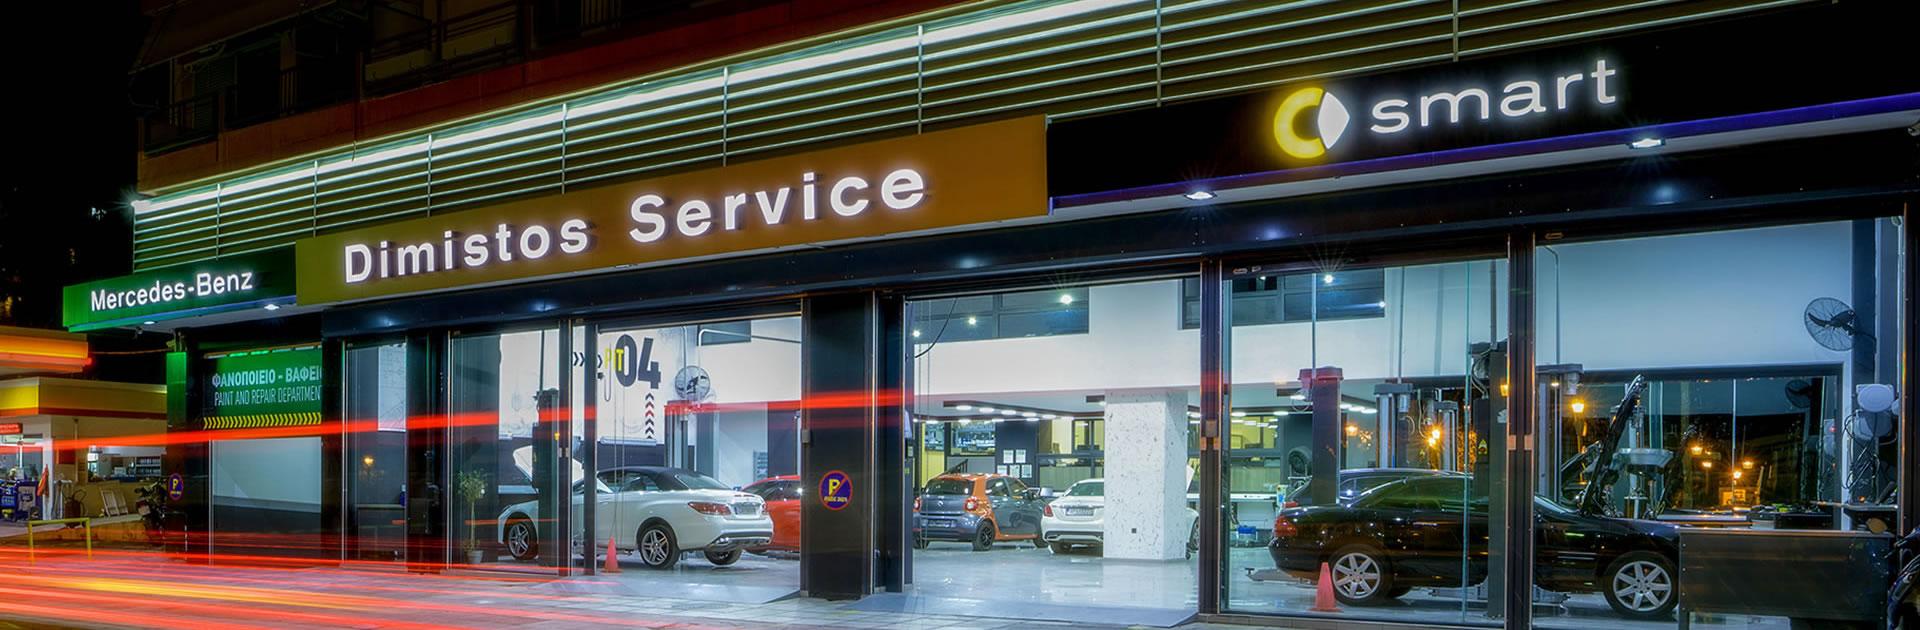 Dimistos - Mercedes & SMART Service